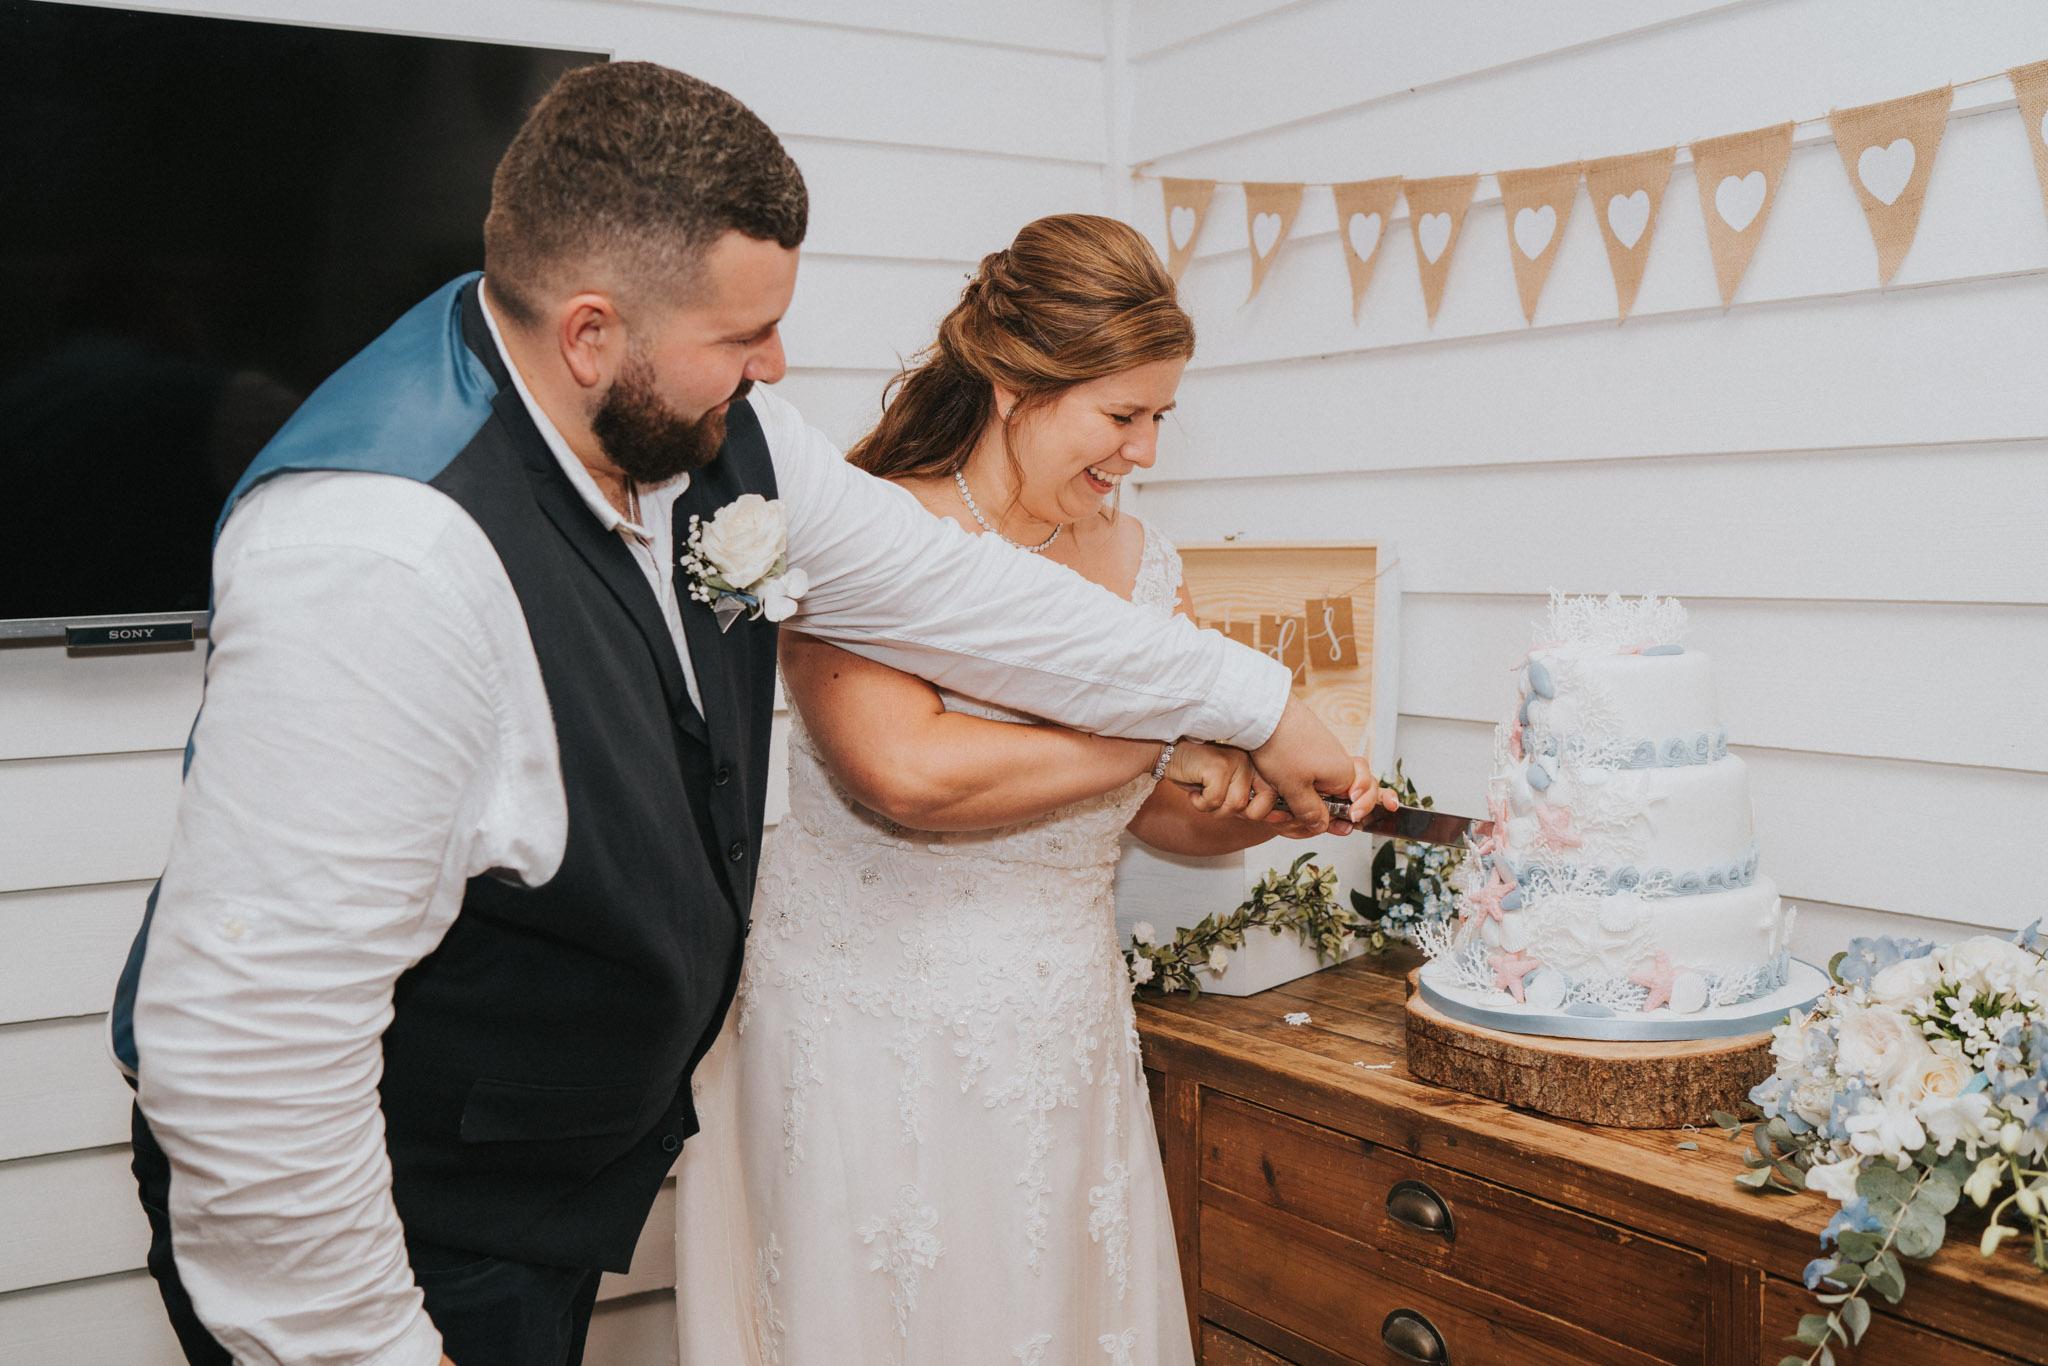 John-Amy-Tunnels-Beaches-Ilfracombe-Devon-Outdoor-Wedding-UK-Colchester-Essex-Alternative-Wedding-Photographer-Grace-Elizabeth (30 of 31).jpg